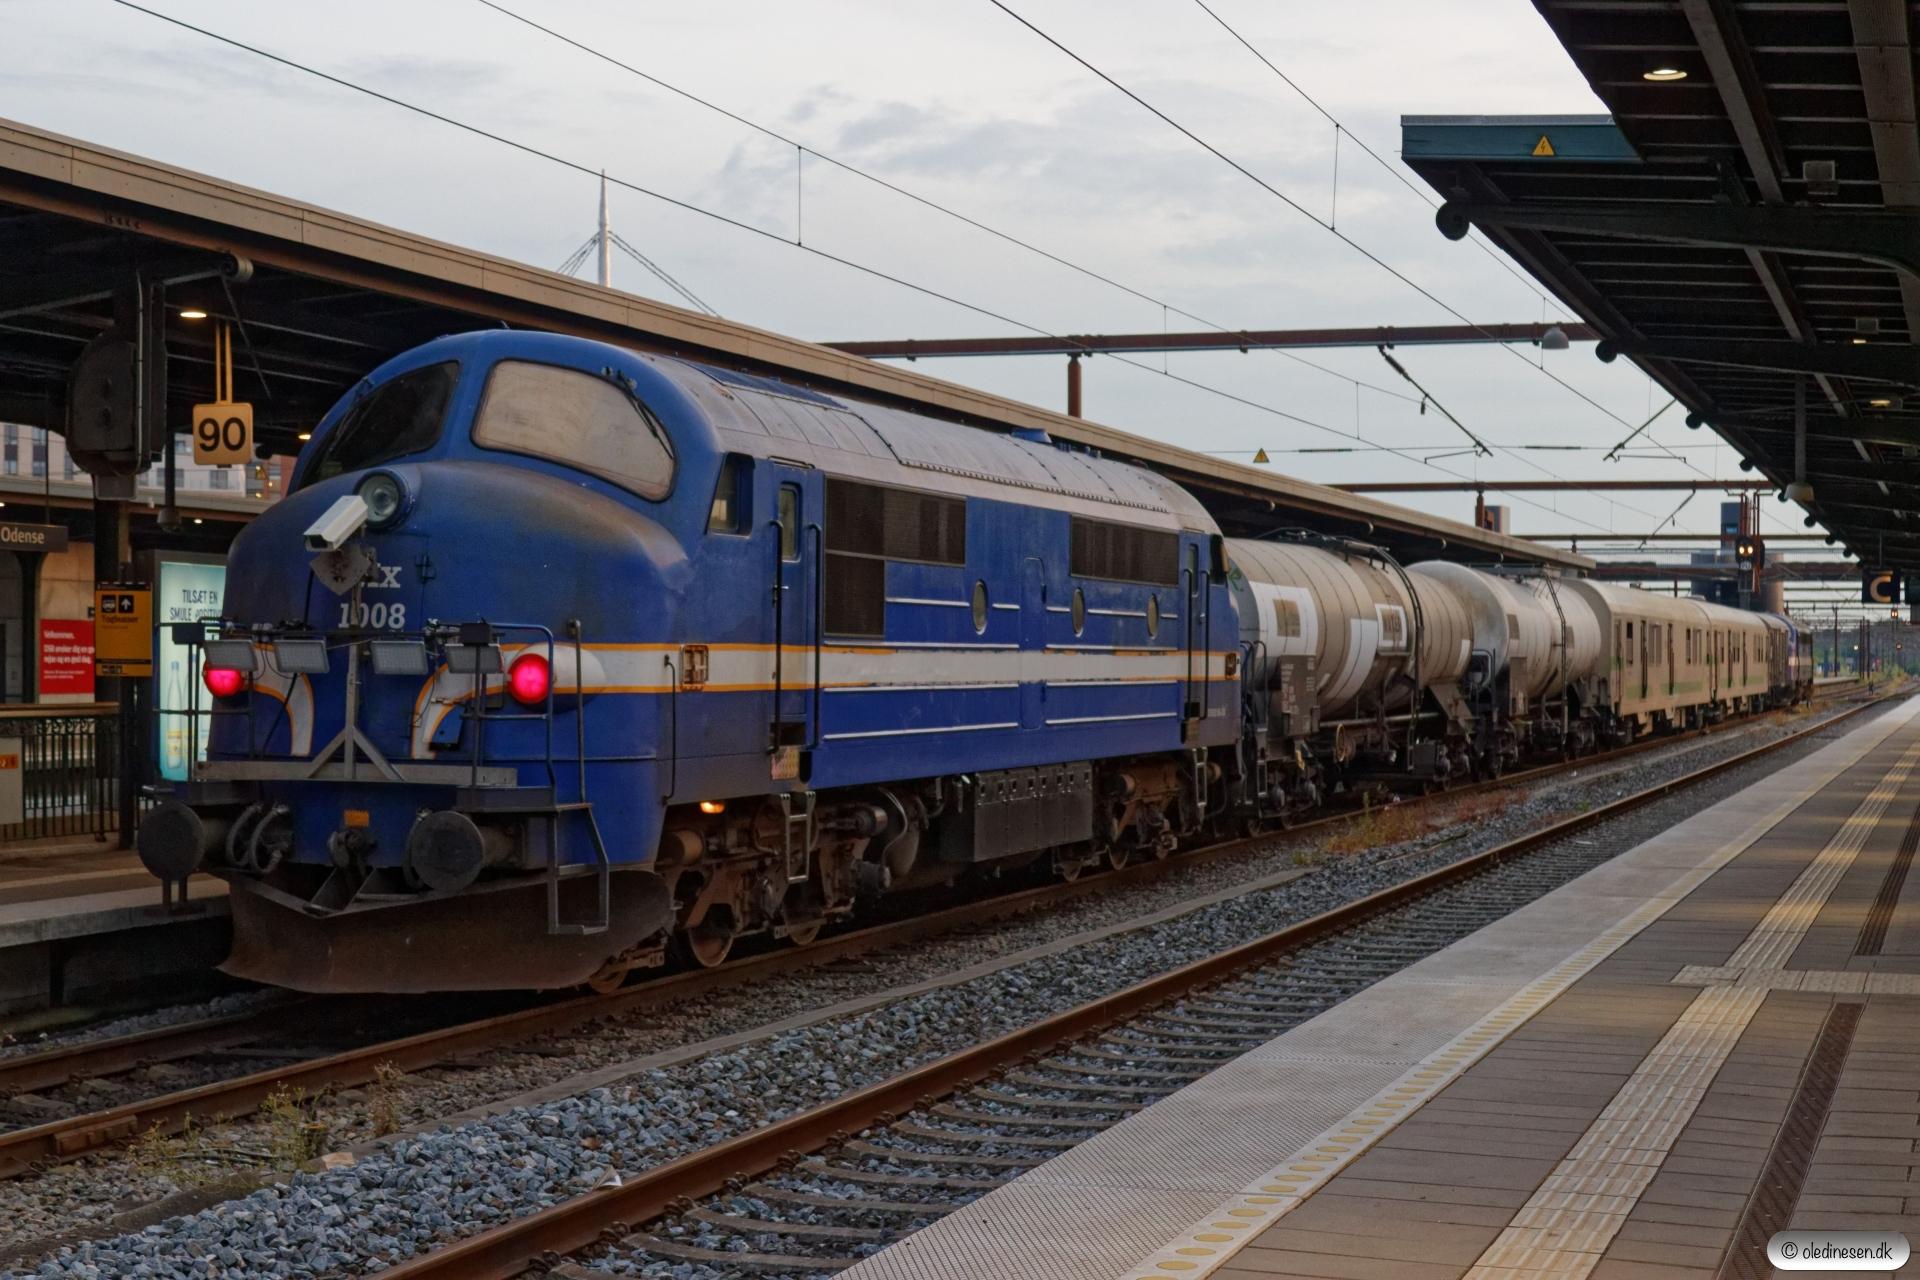 CONTC MY 1153+Weedfree sprøjtetog+CONTC MX 1008 som BM 238713 Ro-Od. Odense 11.07.2019.